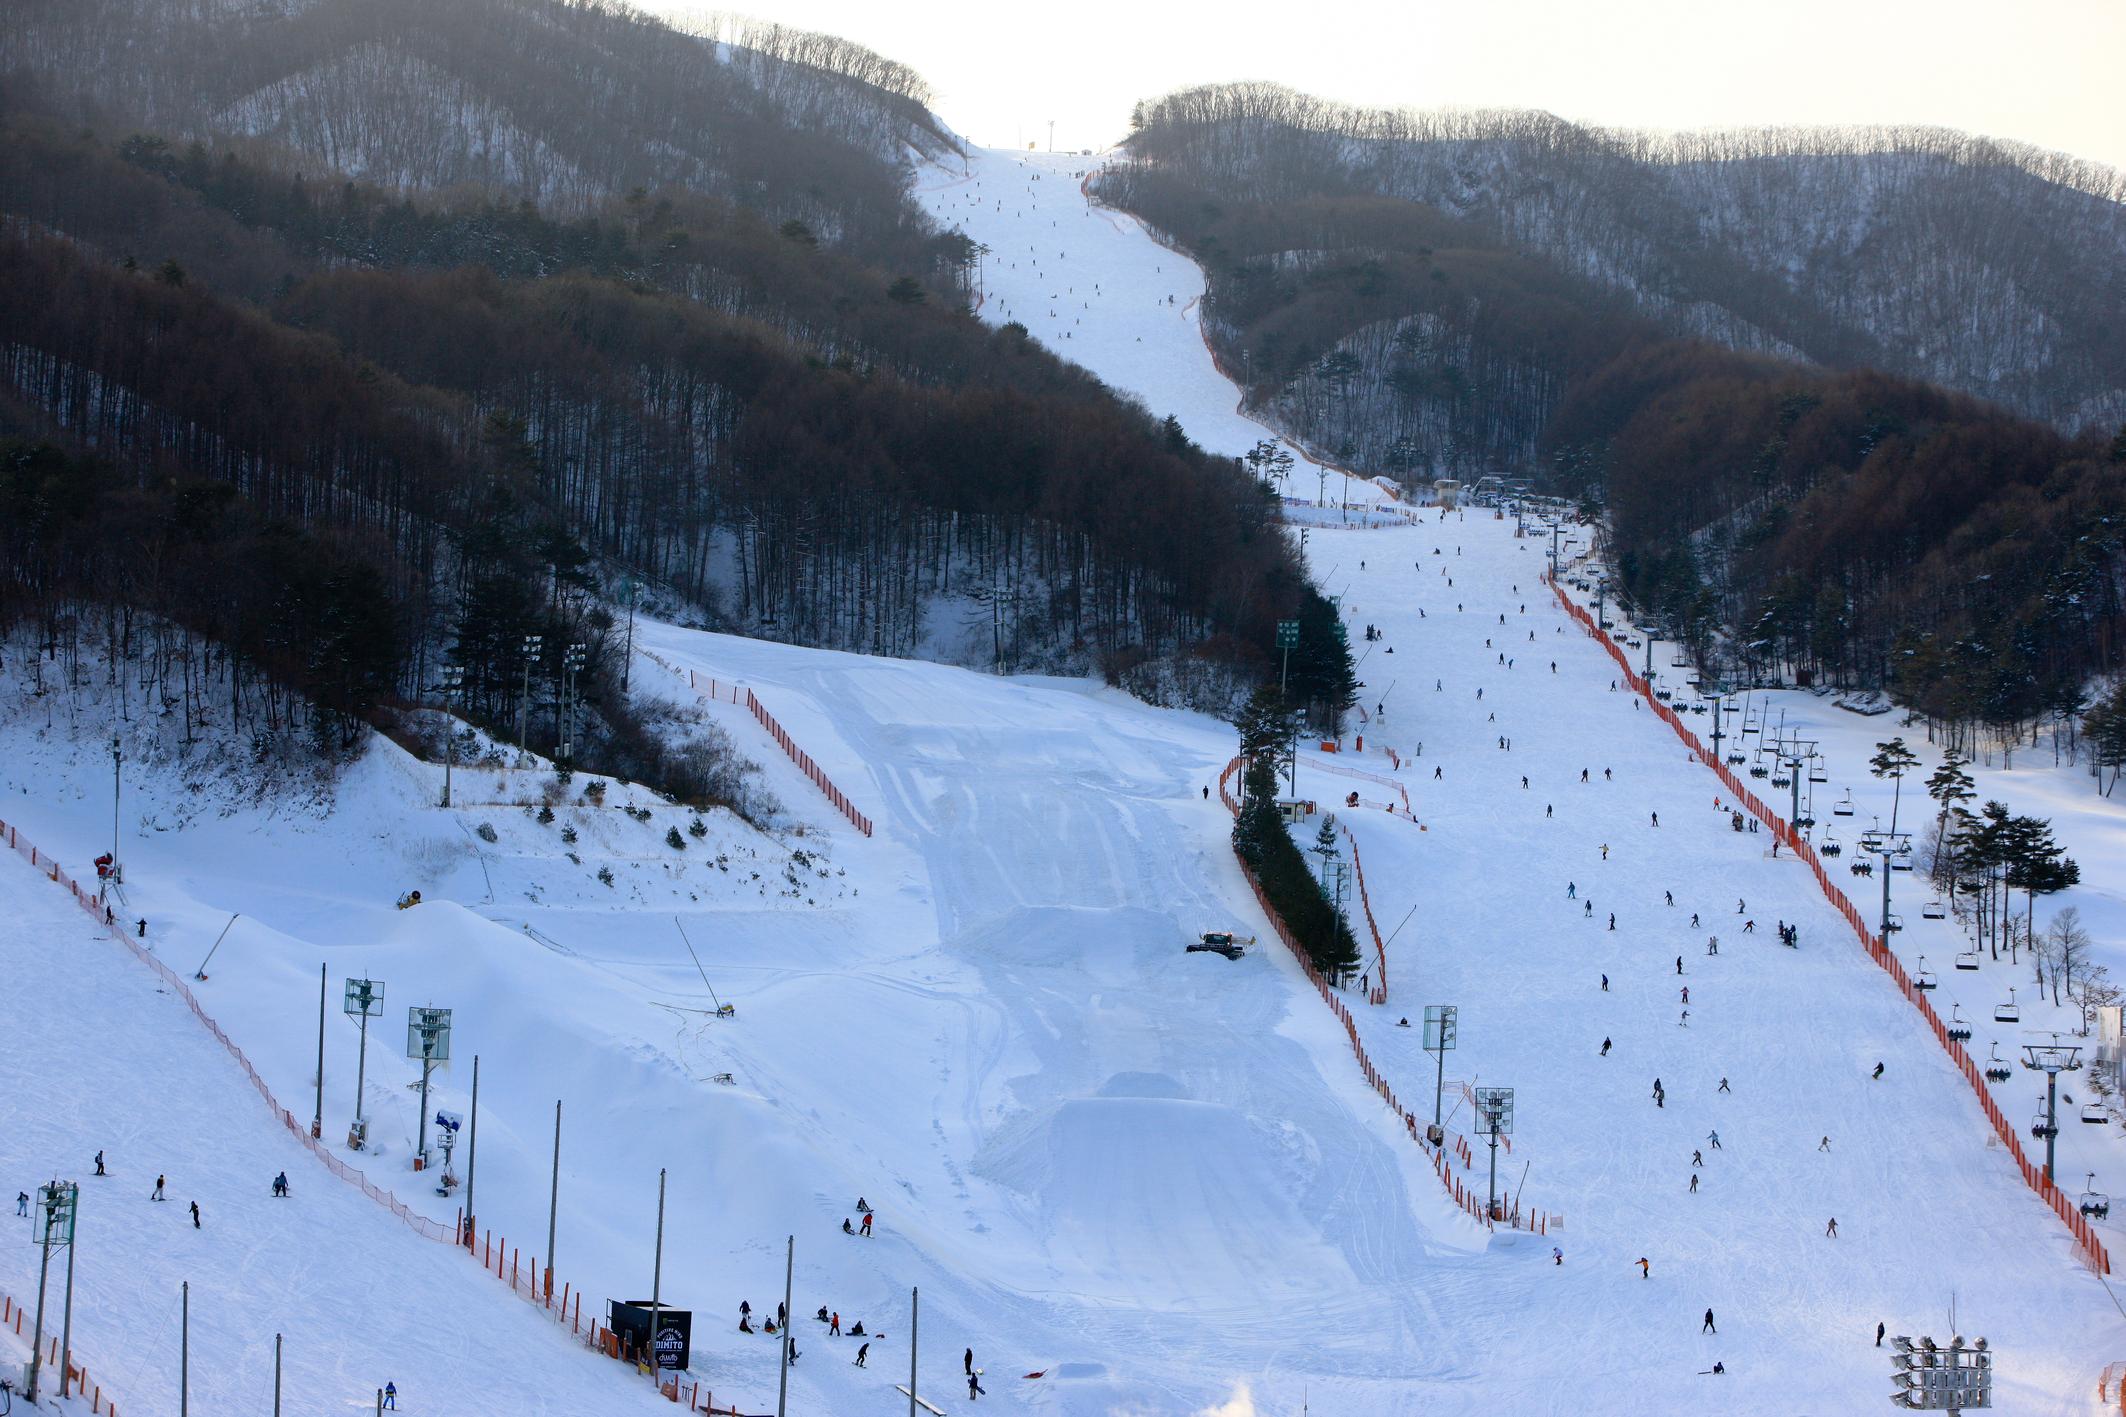 3312017201212064k_Phoenix Park Ski Resort